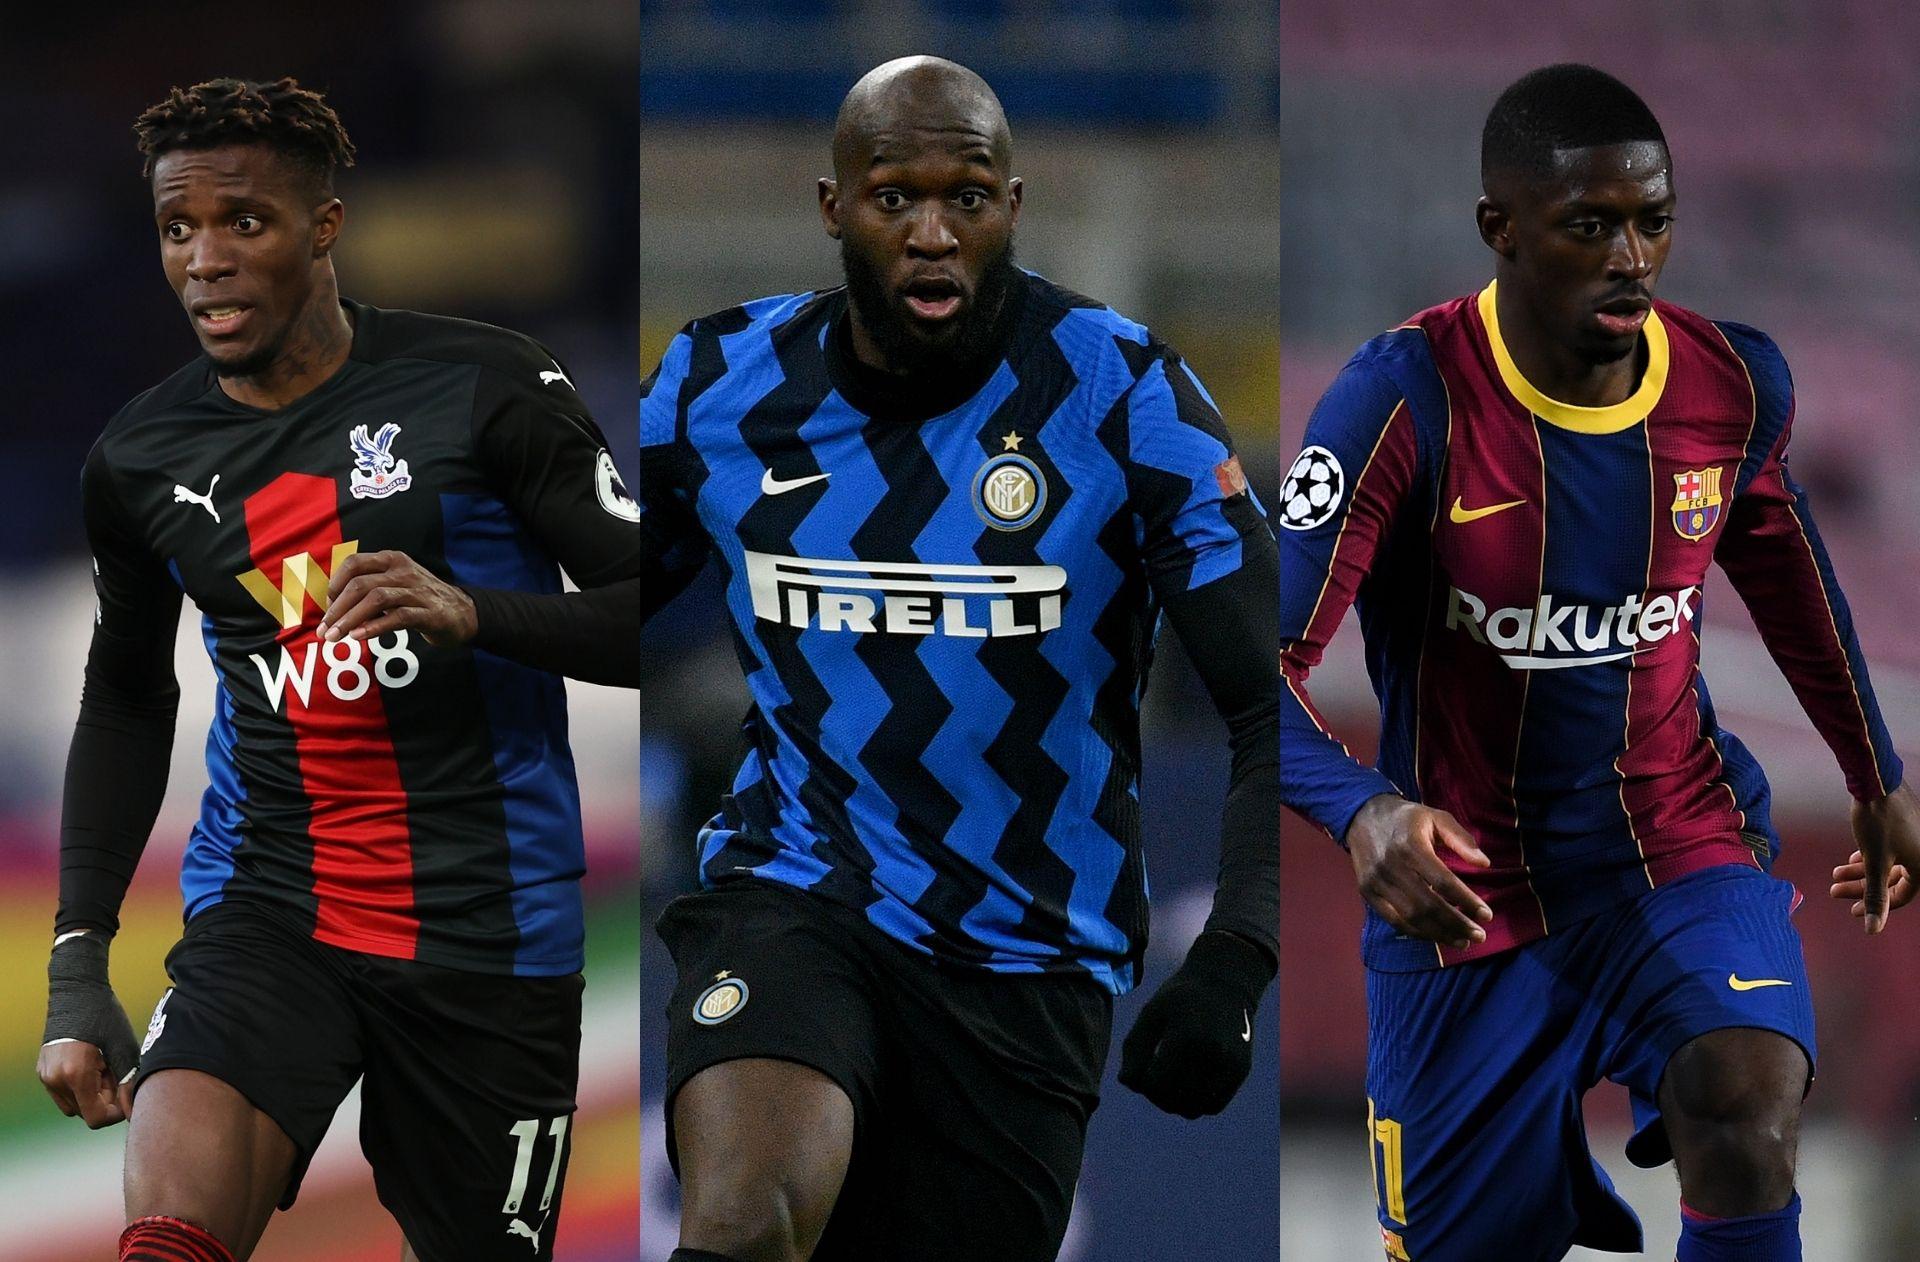 Wilfried Zaha of Crystal Palace, Romelu Lukaku of Inter Milan, Ousmane Dembele of Barcelona